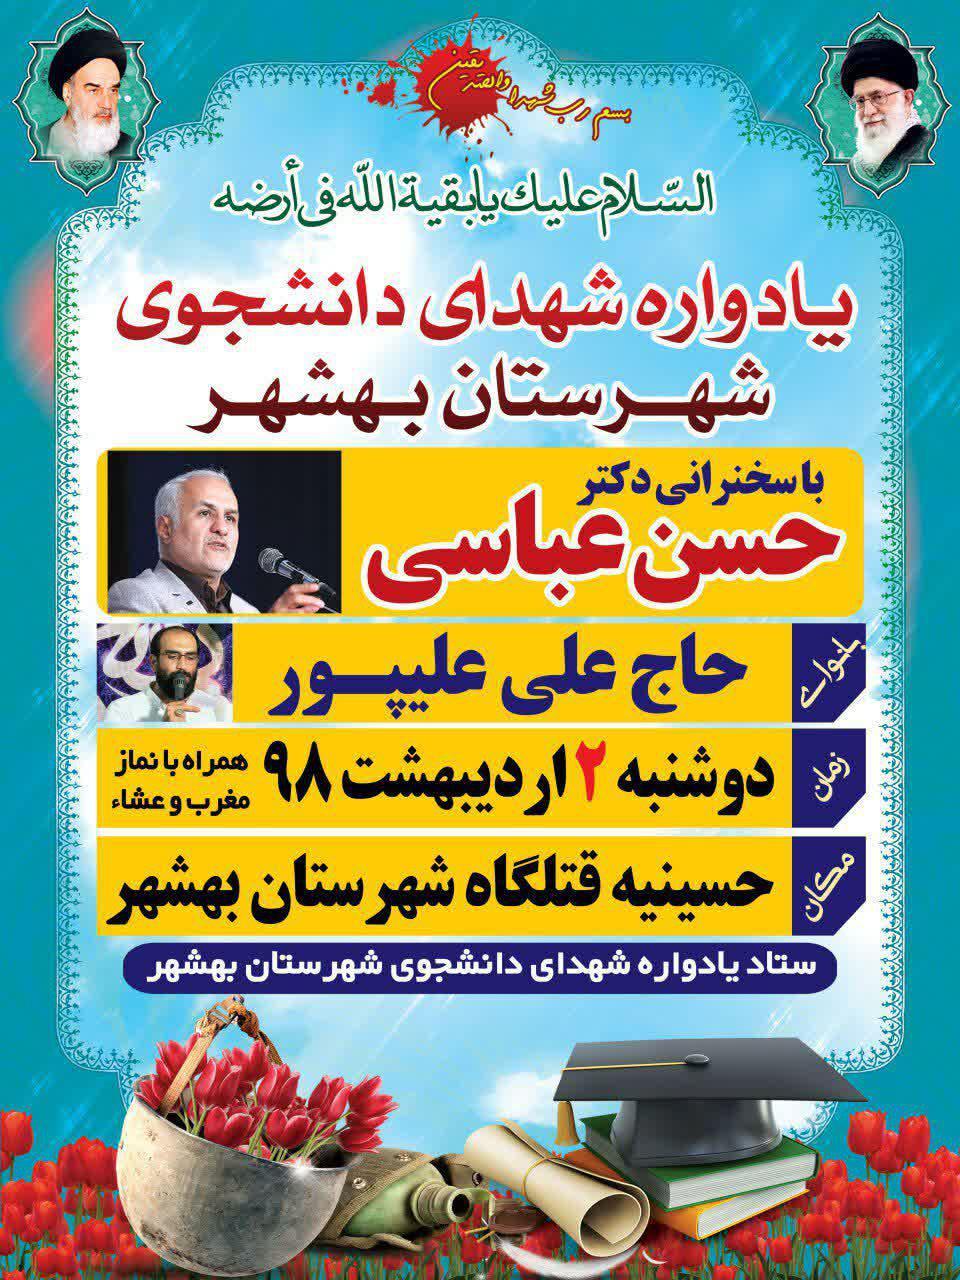 photo 2019 04 25 12 56 59 ۲ اردیبهشت ۹۸؛ سخنرانی استاد حسن عباسی در شهرستان بهشهر